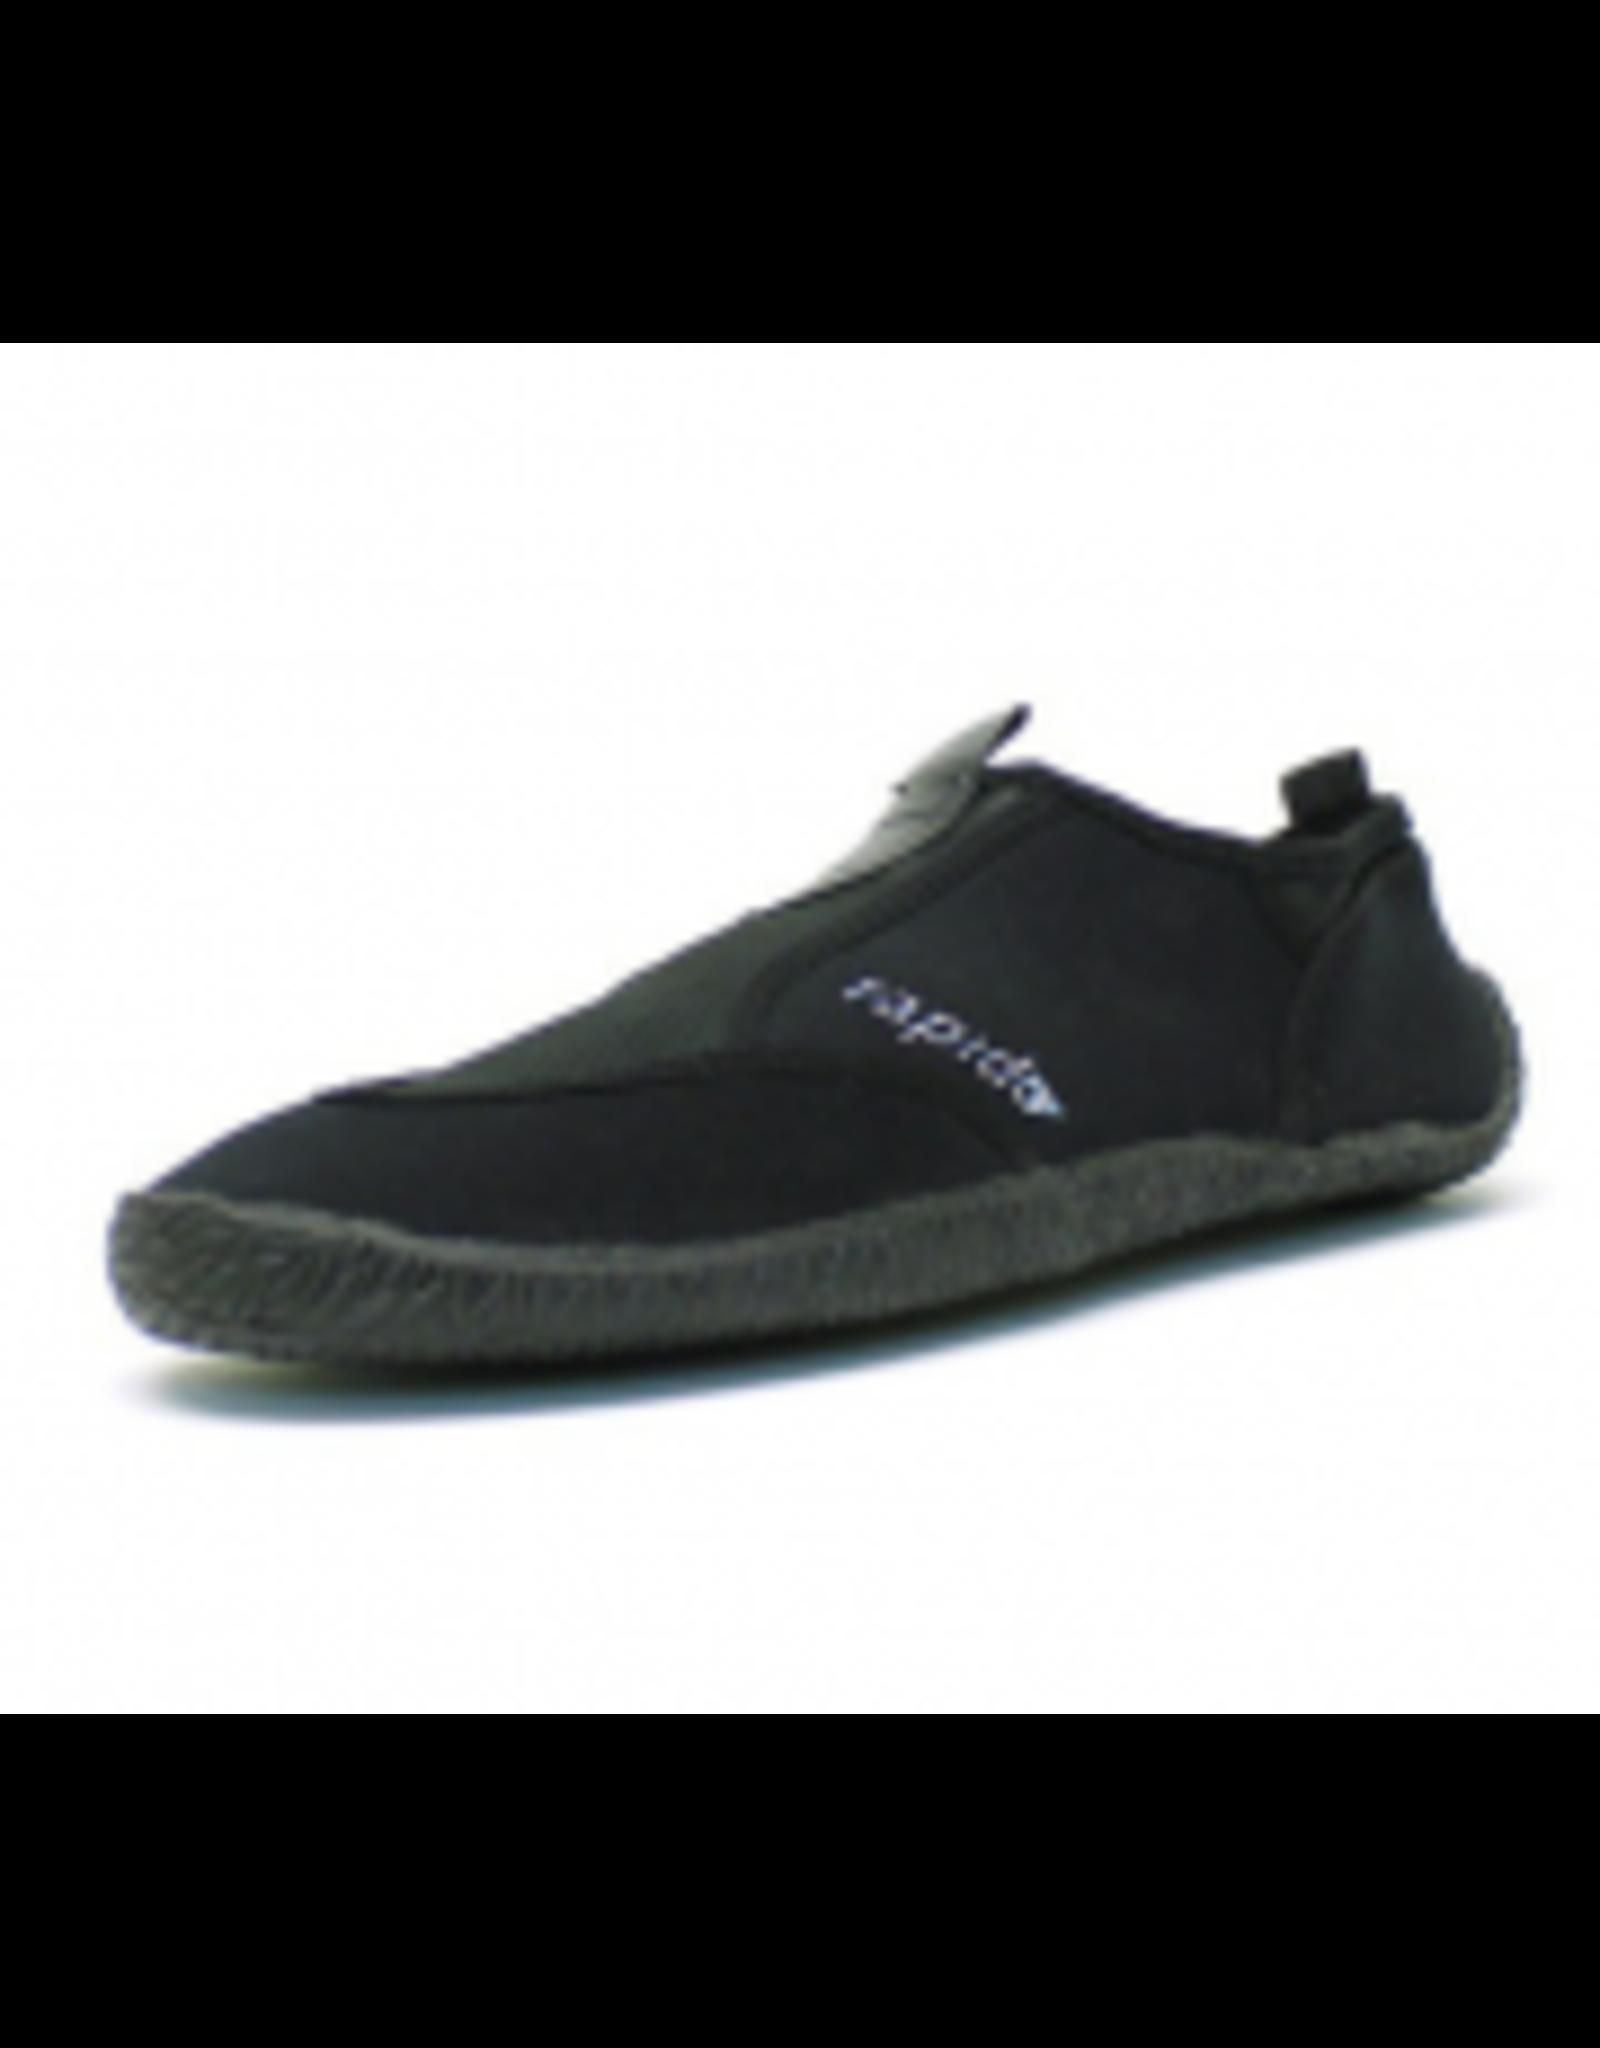 Atlan Atlan neoprene beach shoe